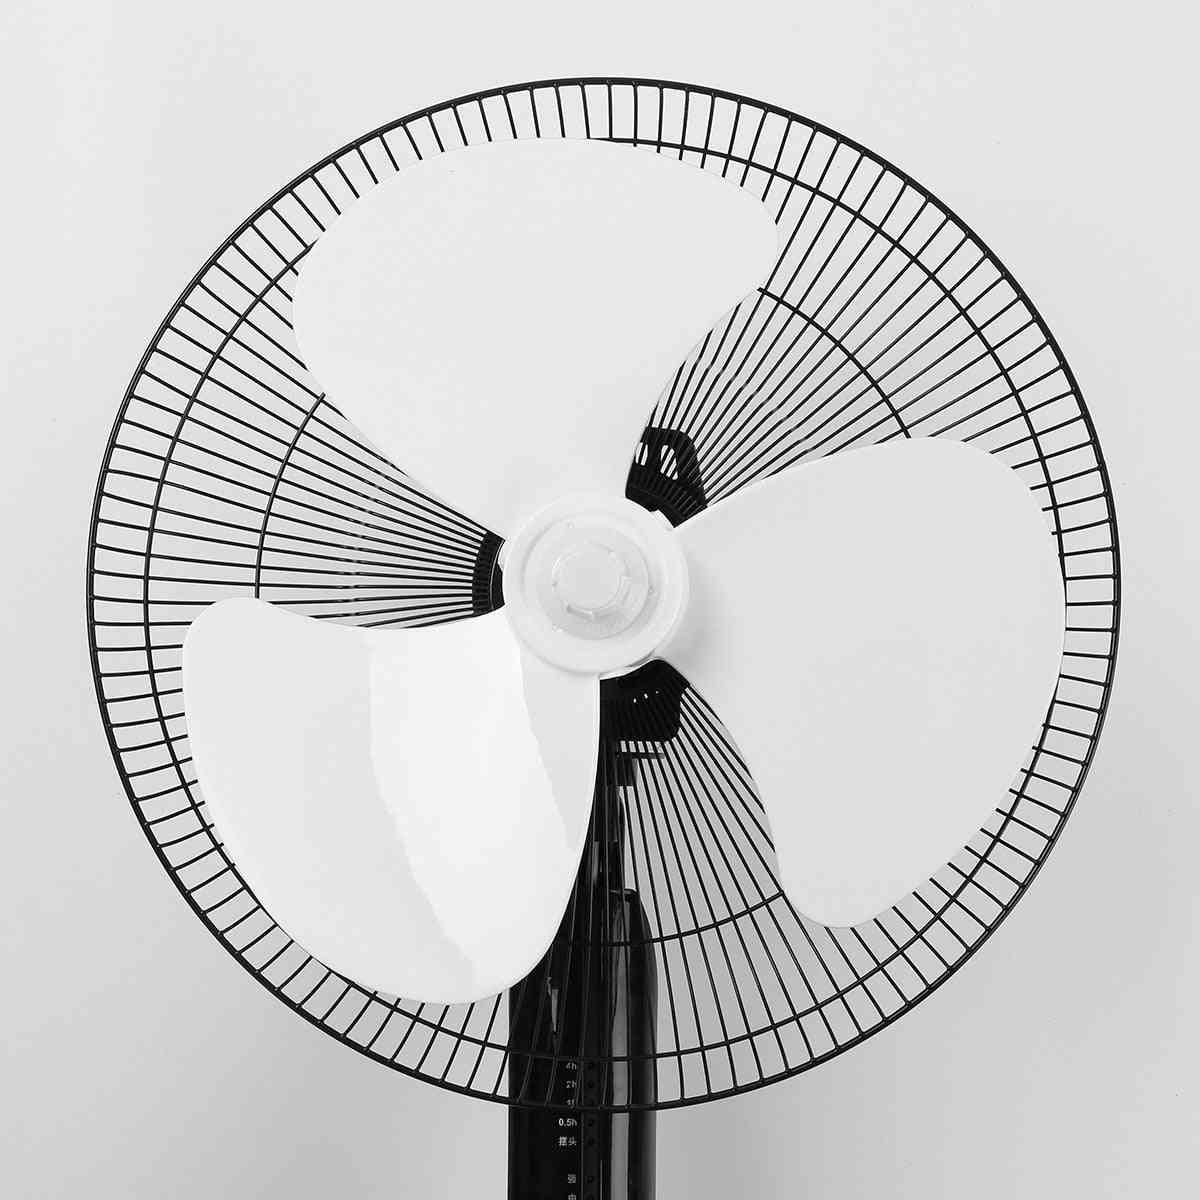 Household Fan Blade Replacement, Three/five Leaves Pedestal Fan Table